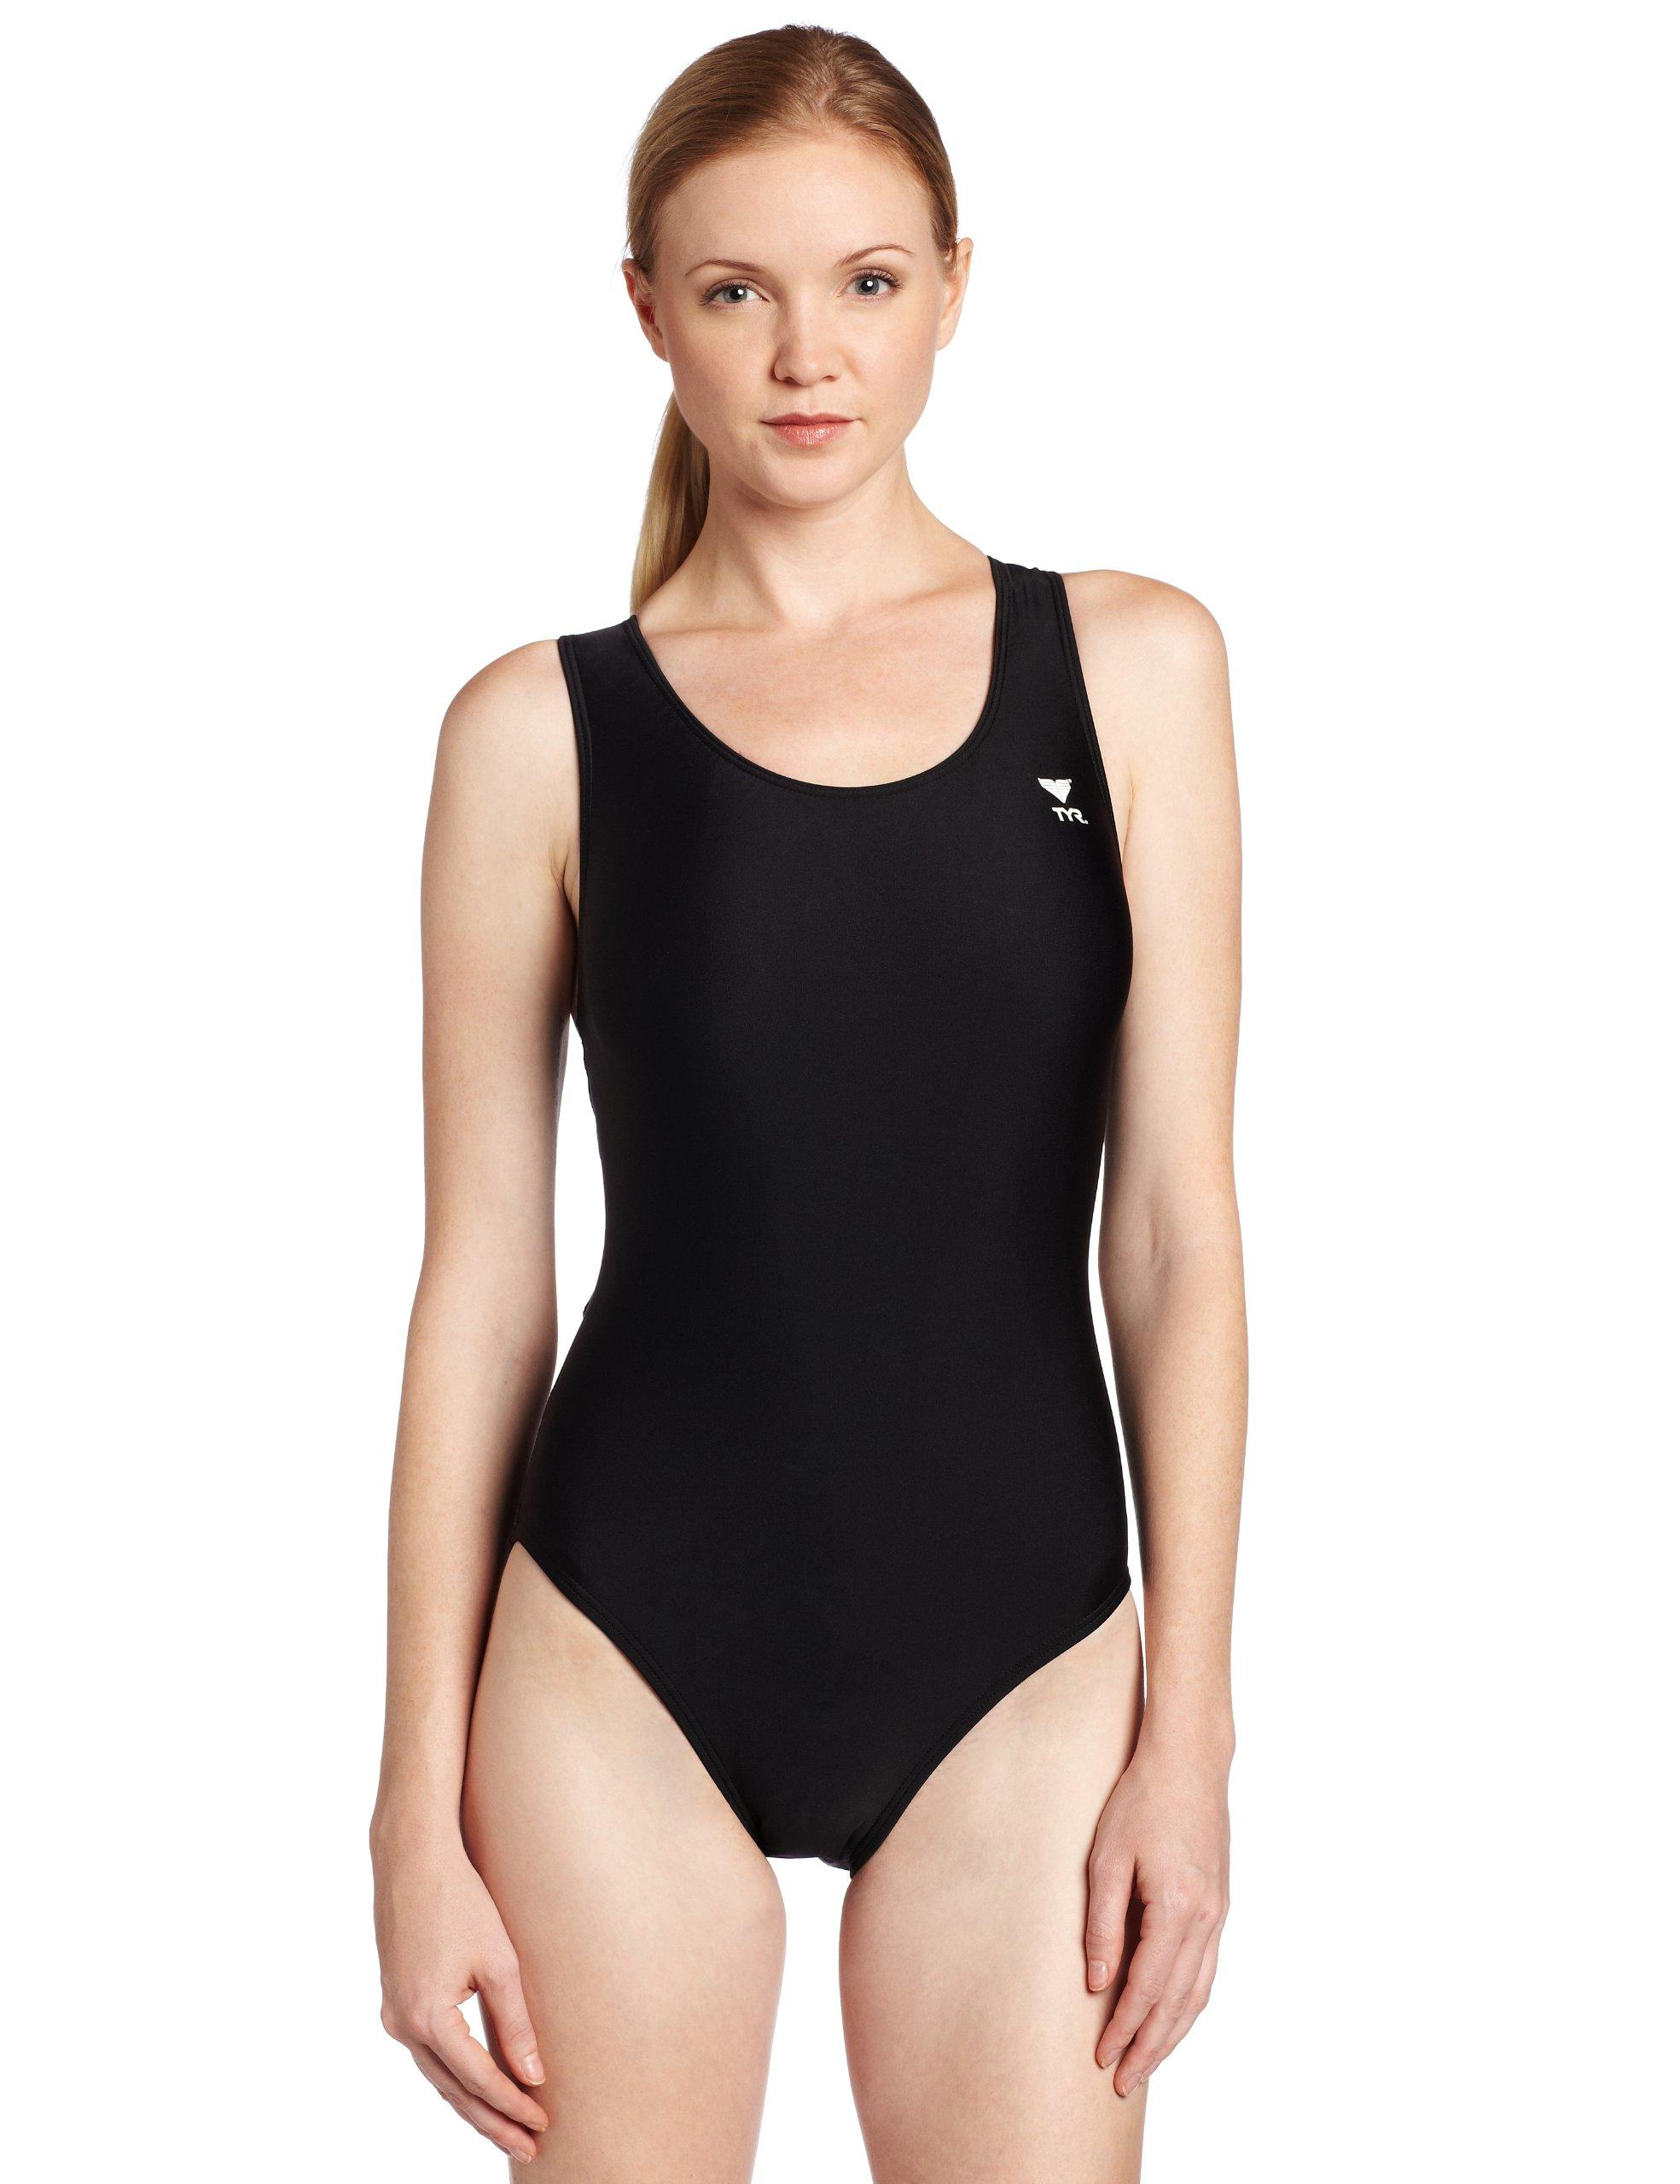 TYR Sport Women's Solid Maxback Swim Suit (Black, 36)